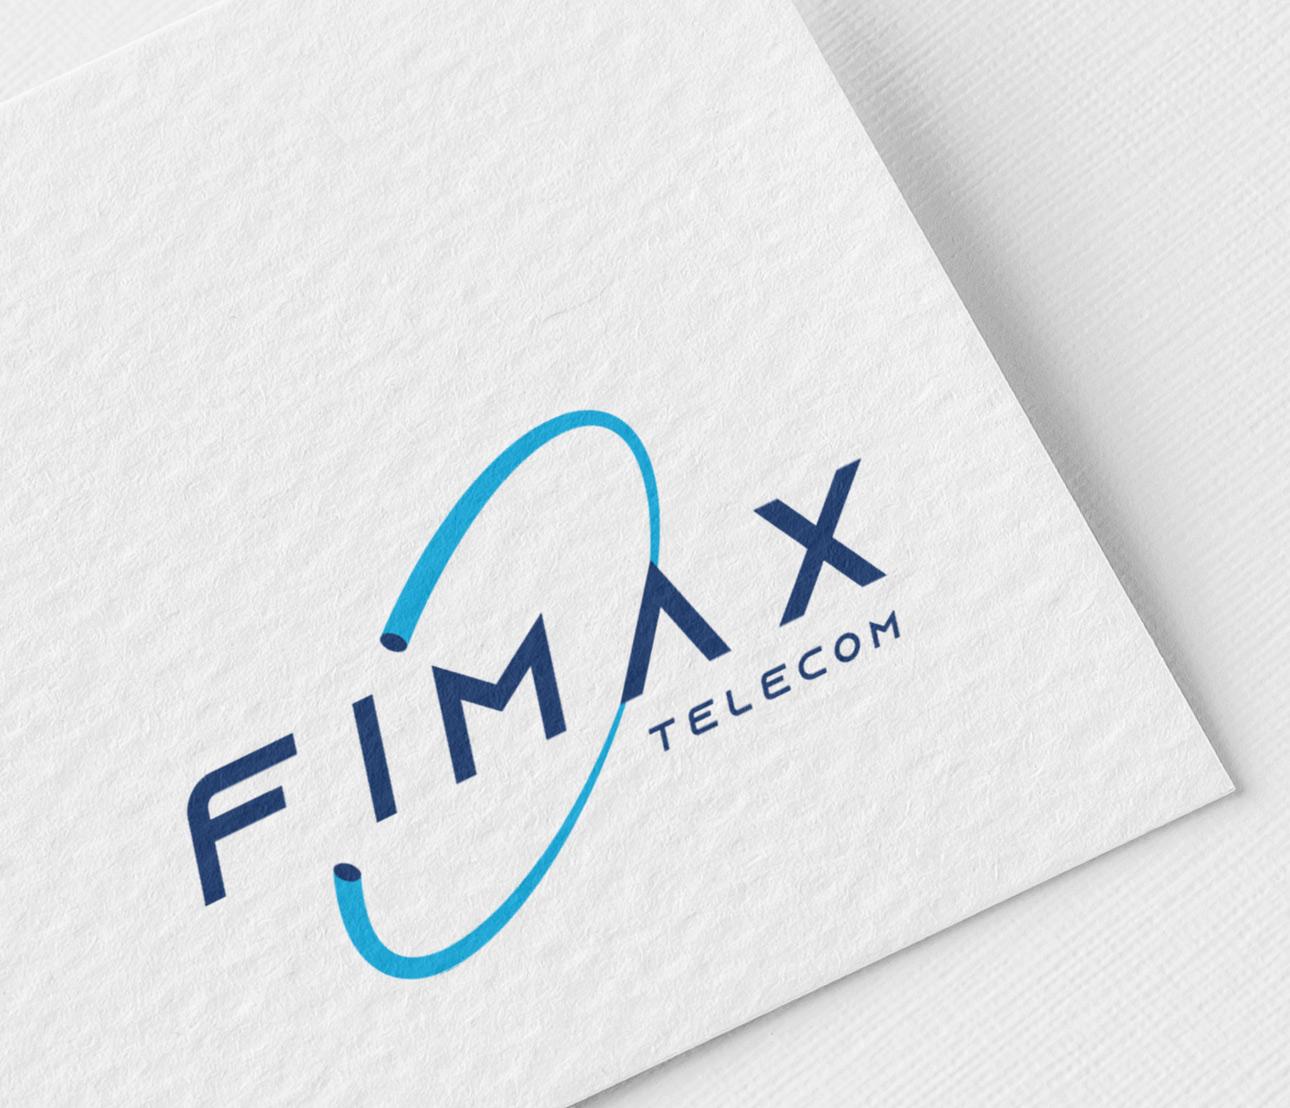 fimax telecom logotipo